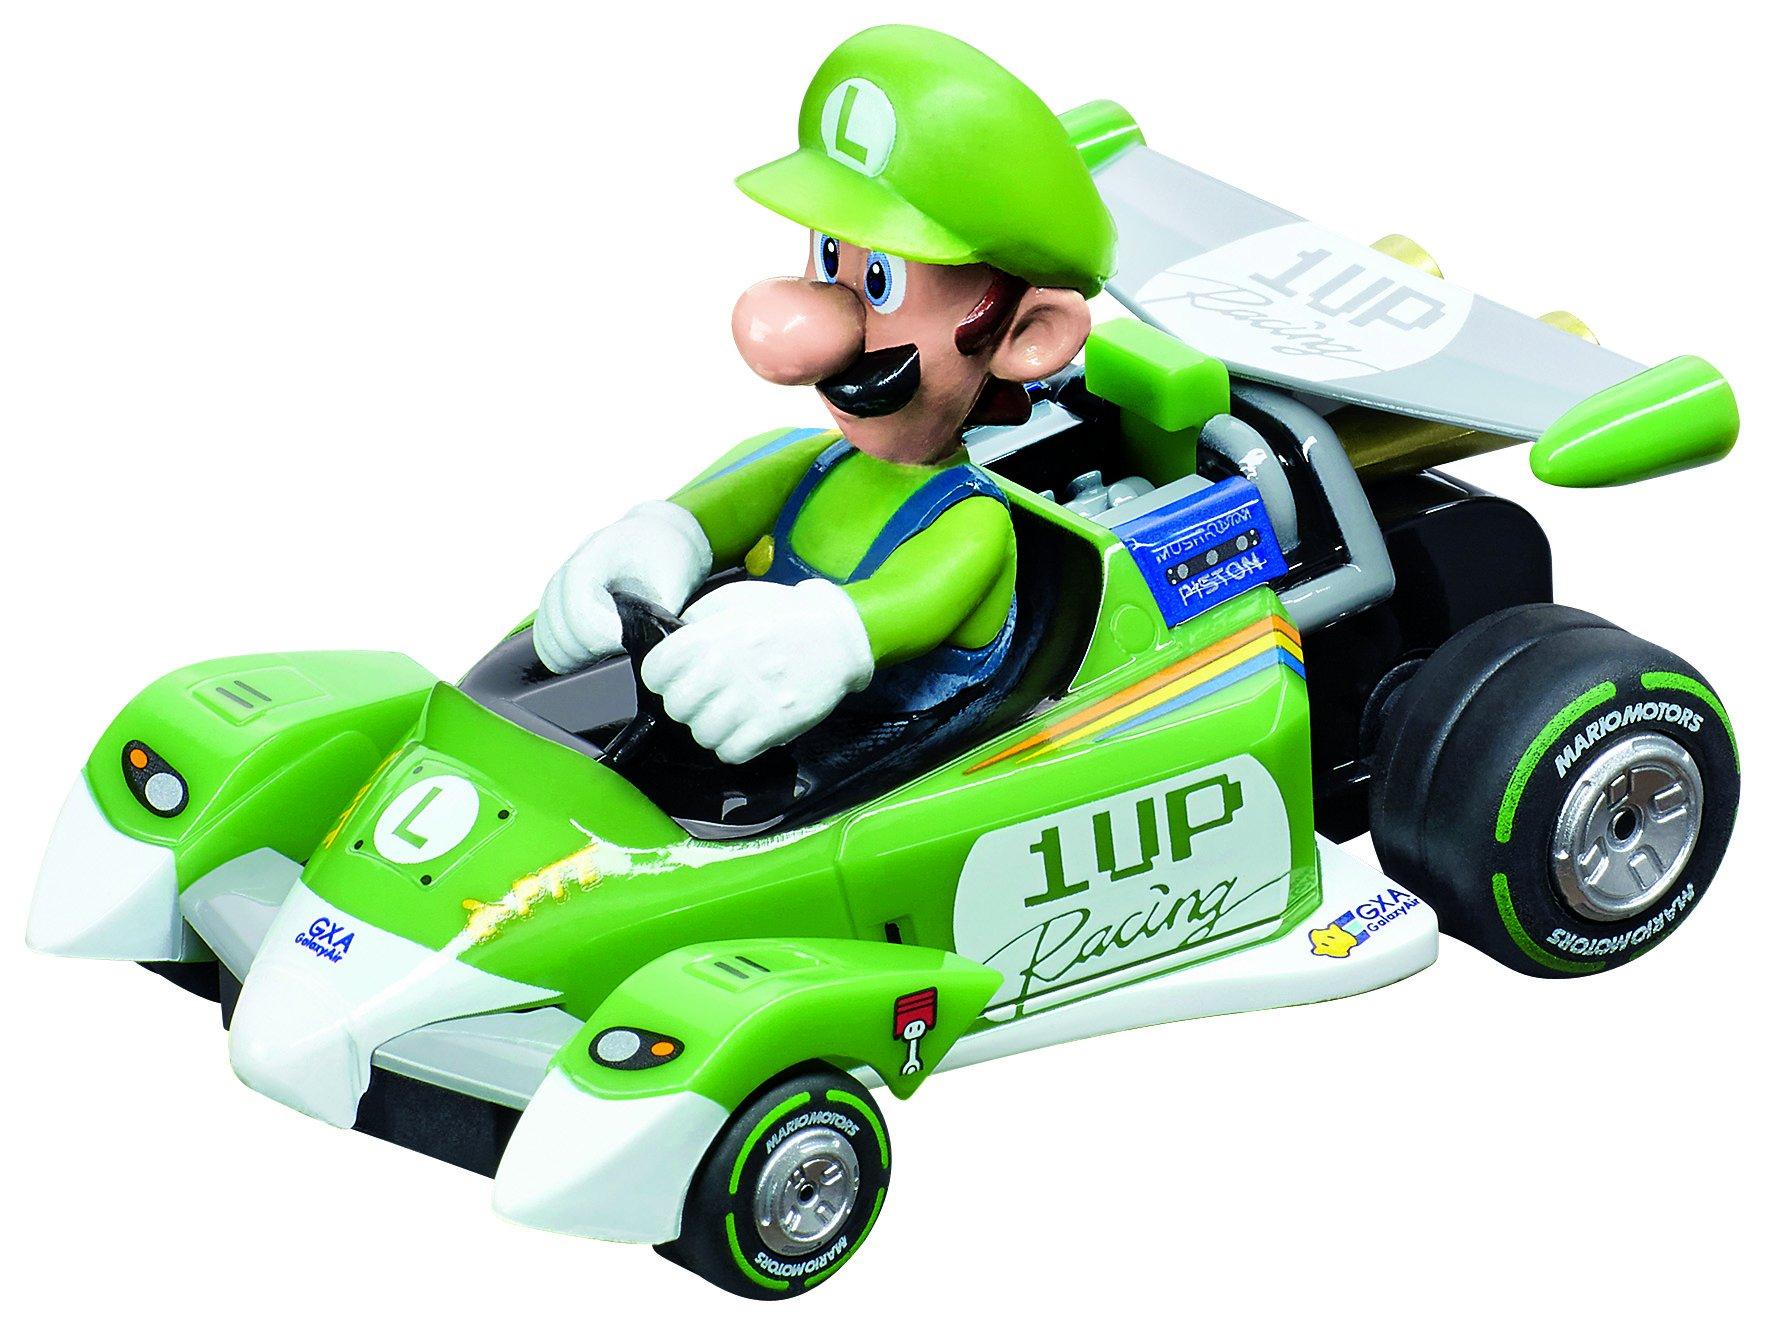 Carrera 64093 GO!!! Mario Kart Circuit Special - Luigi Slot Car (1:43 Scale)